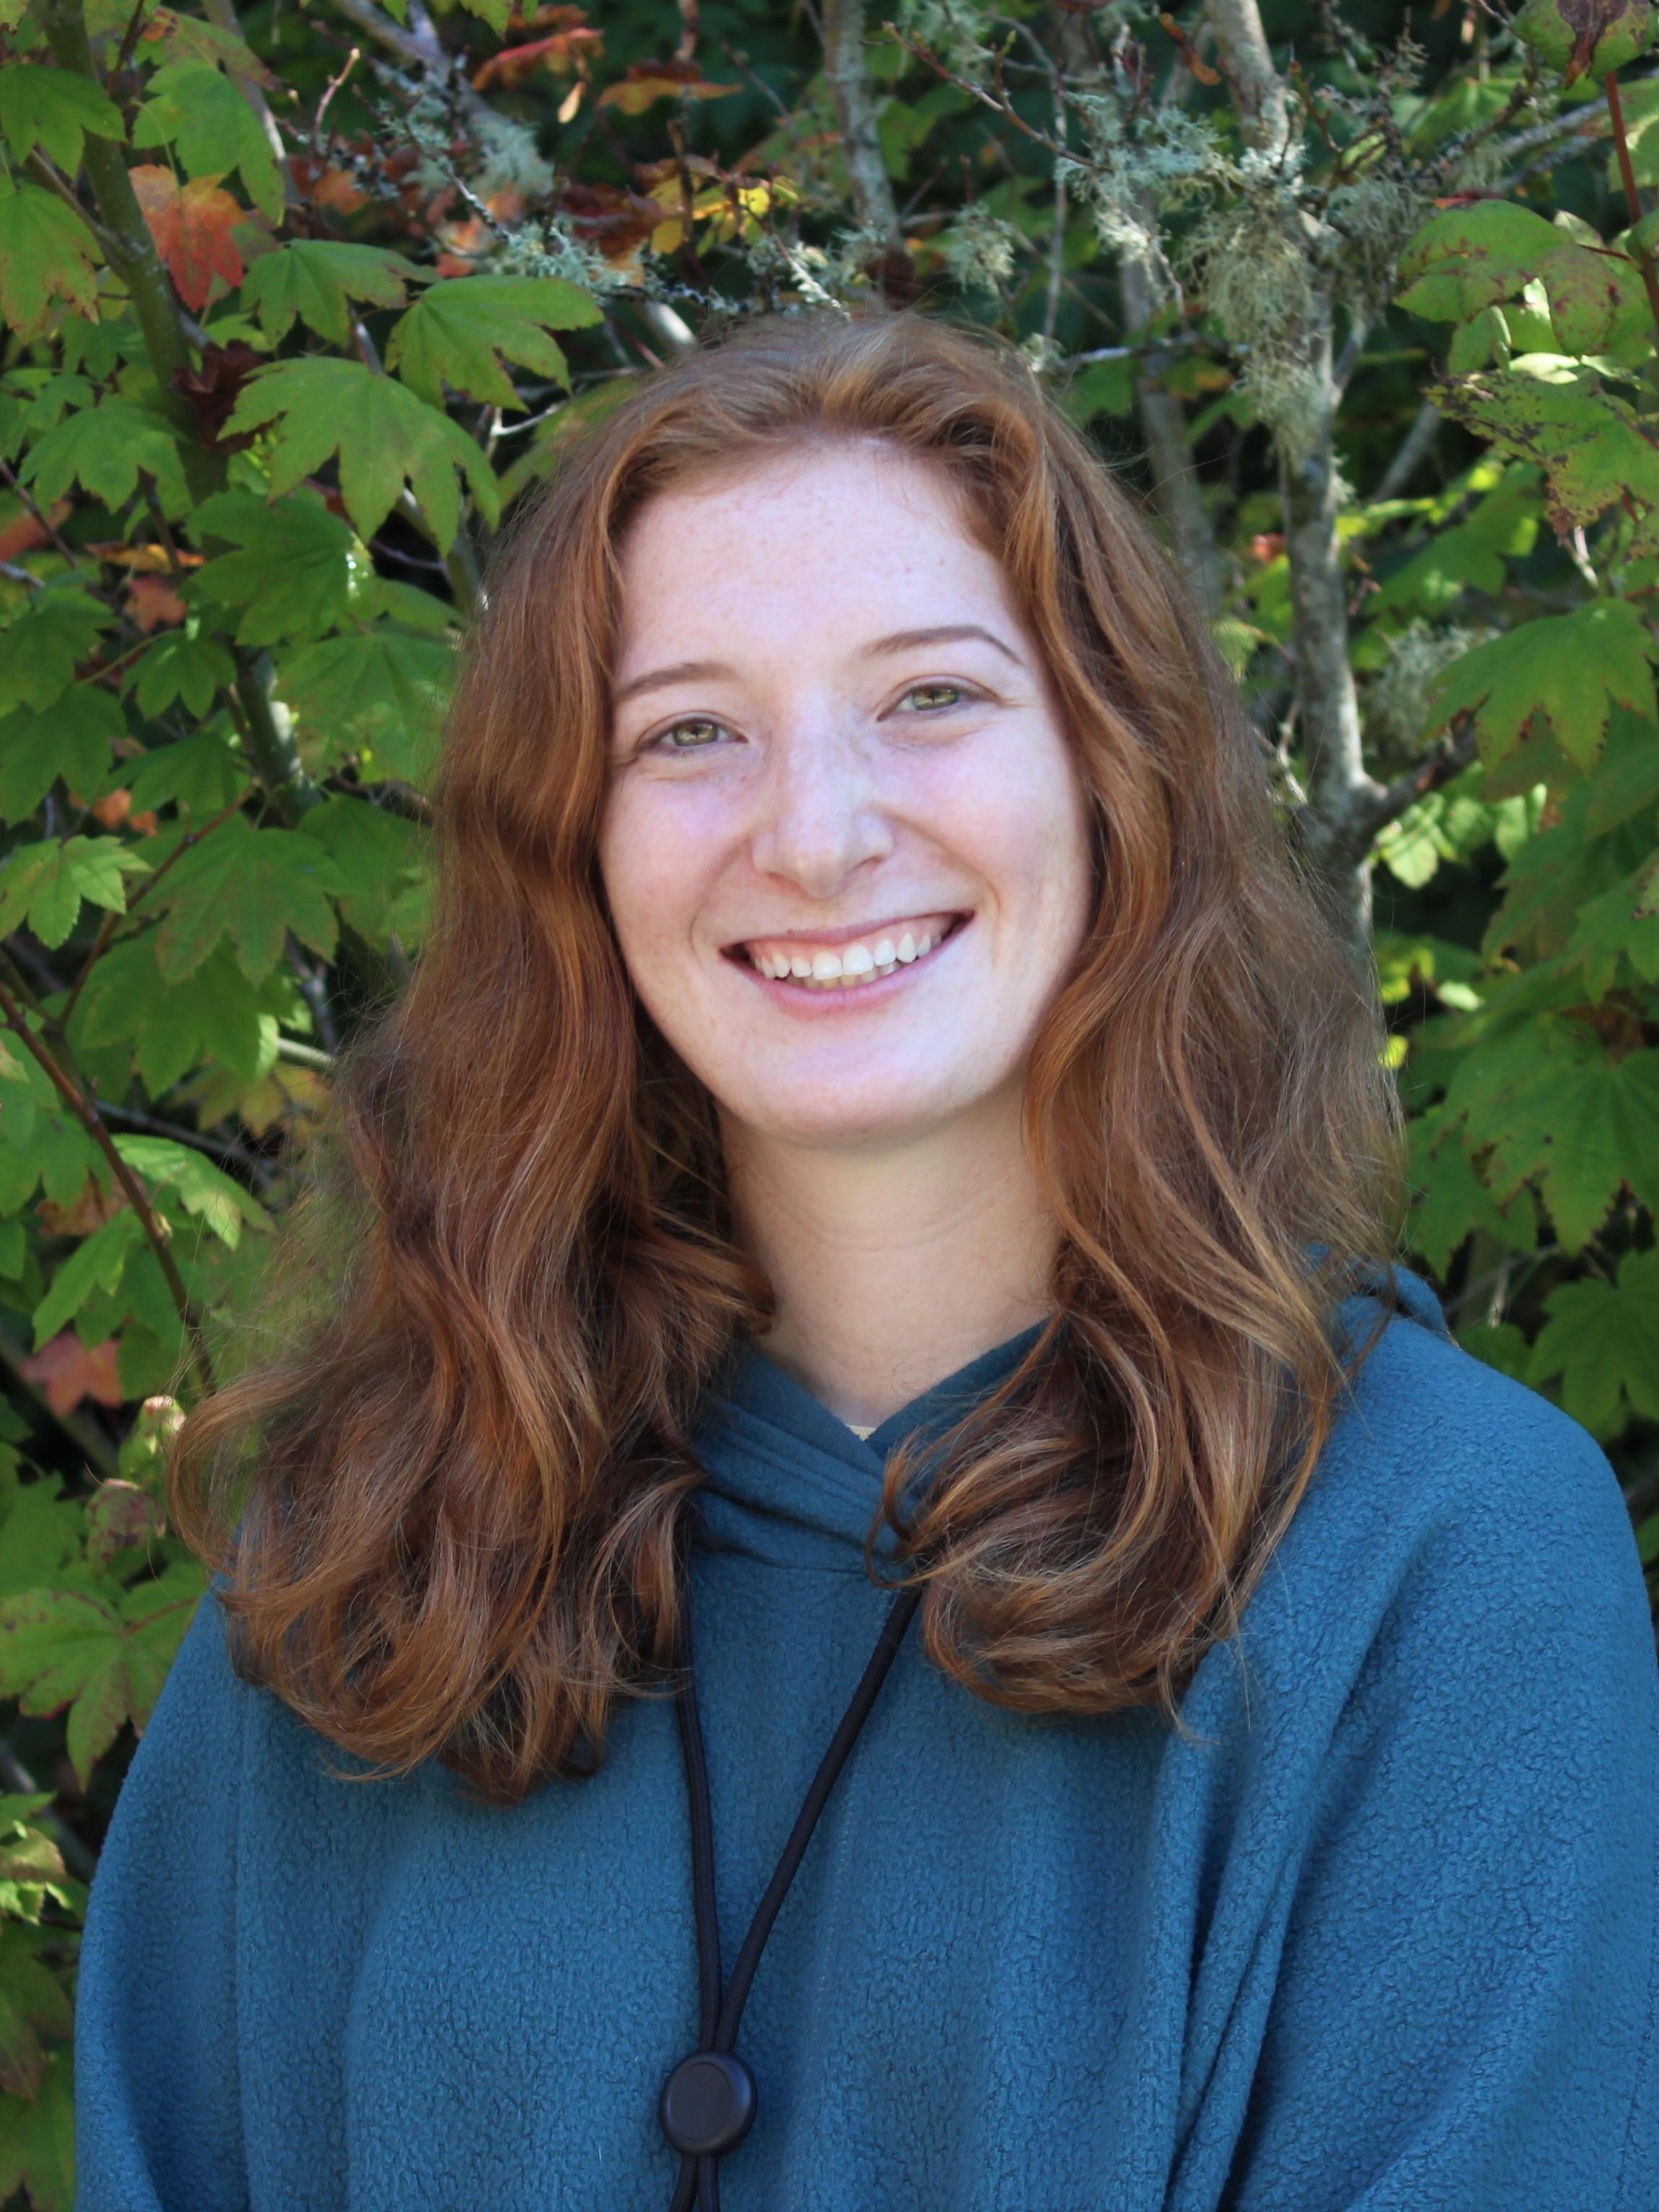 IslandWood Graduate student Claire Naughton